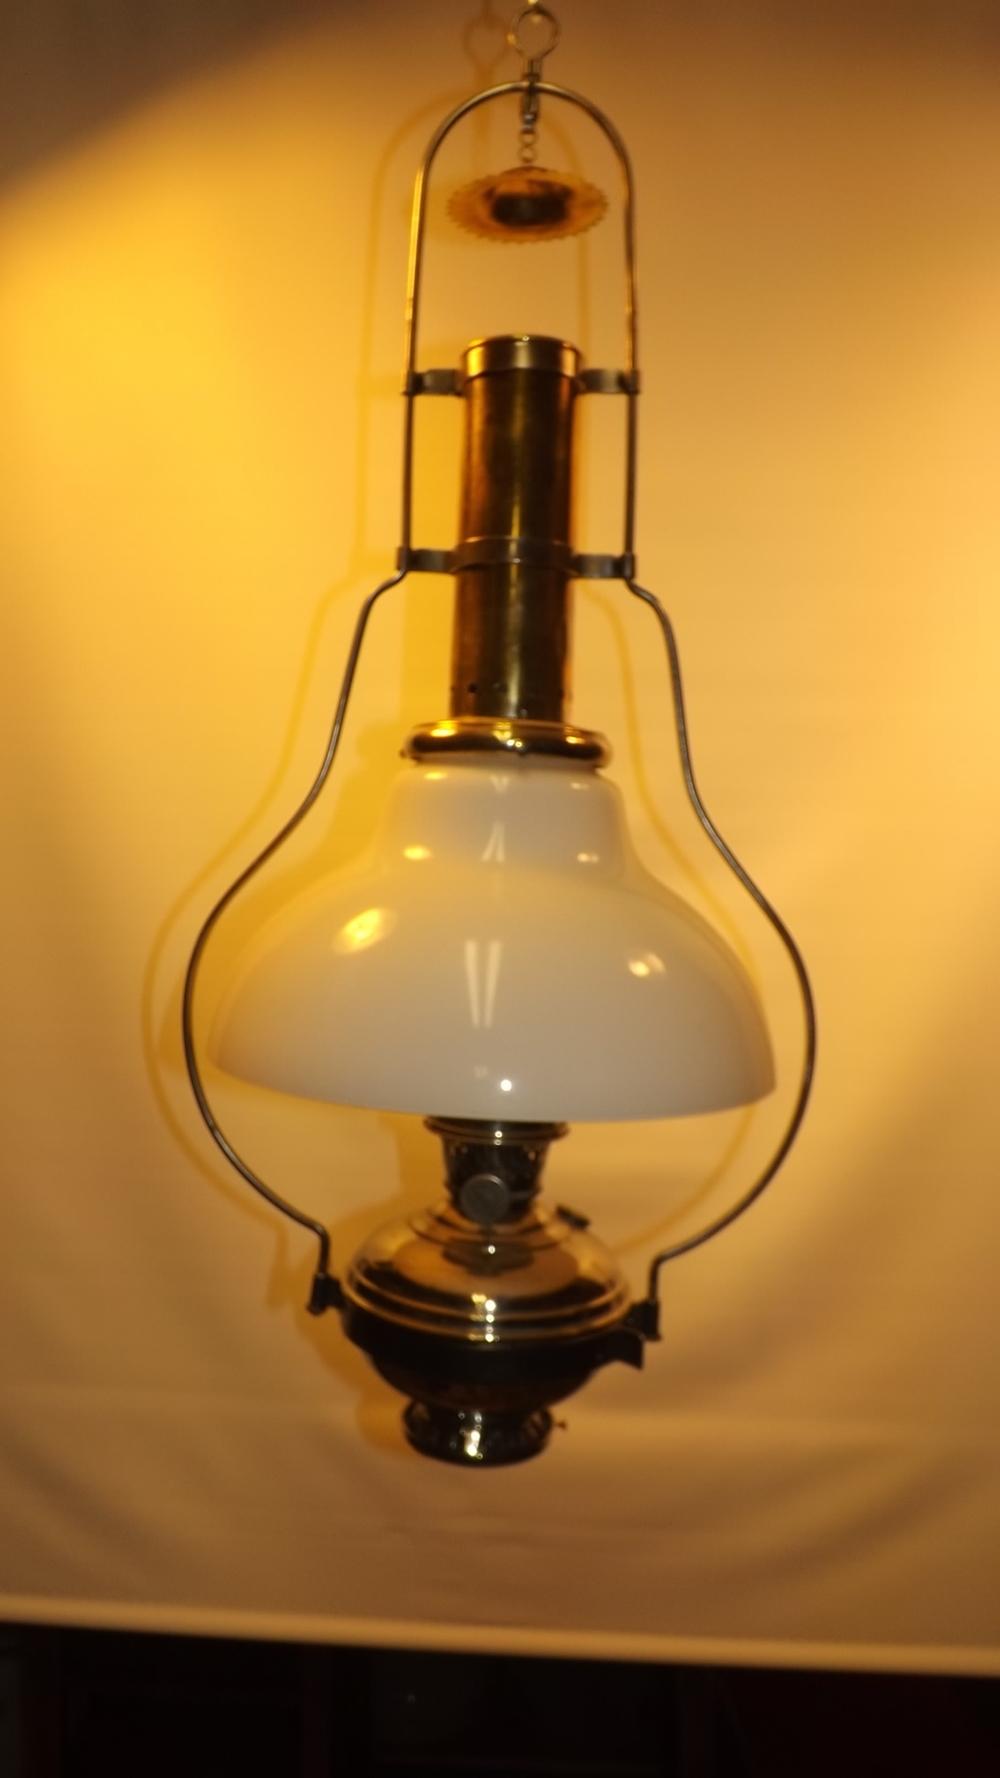 Vintage Antique Hanging Lamps Antique Kerosene Lighting